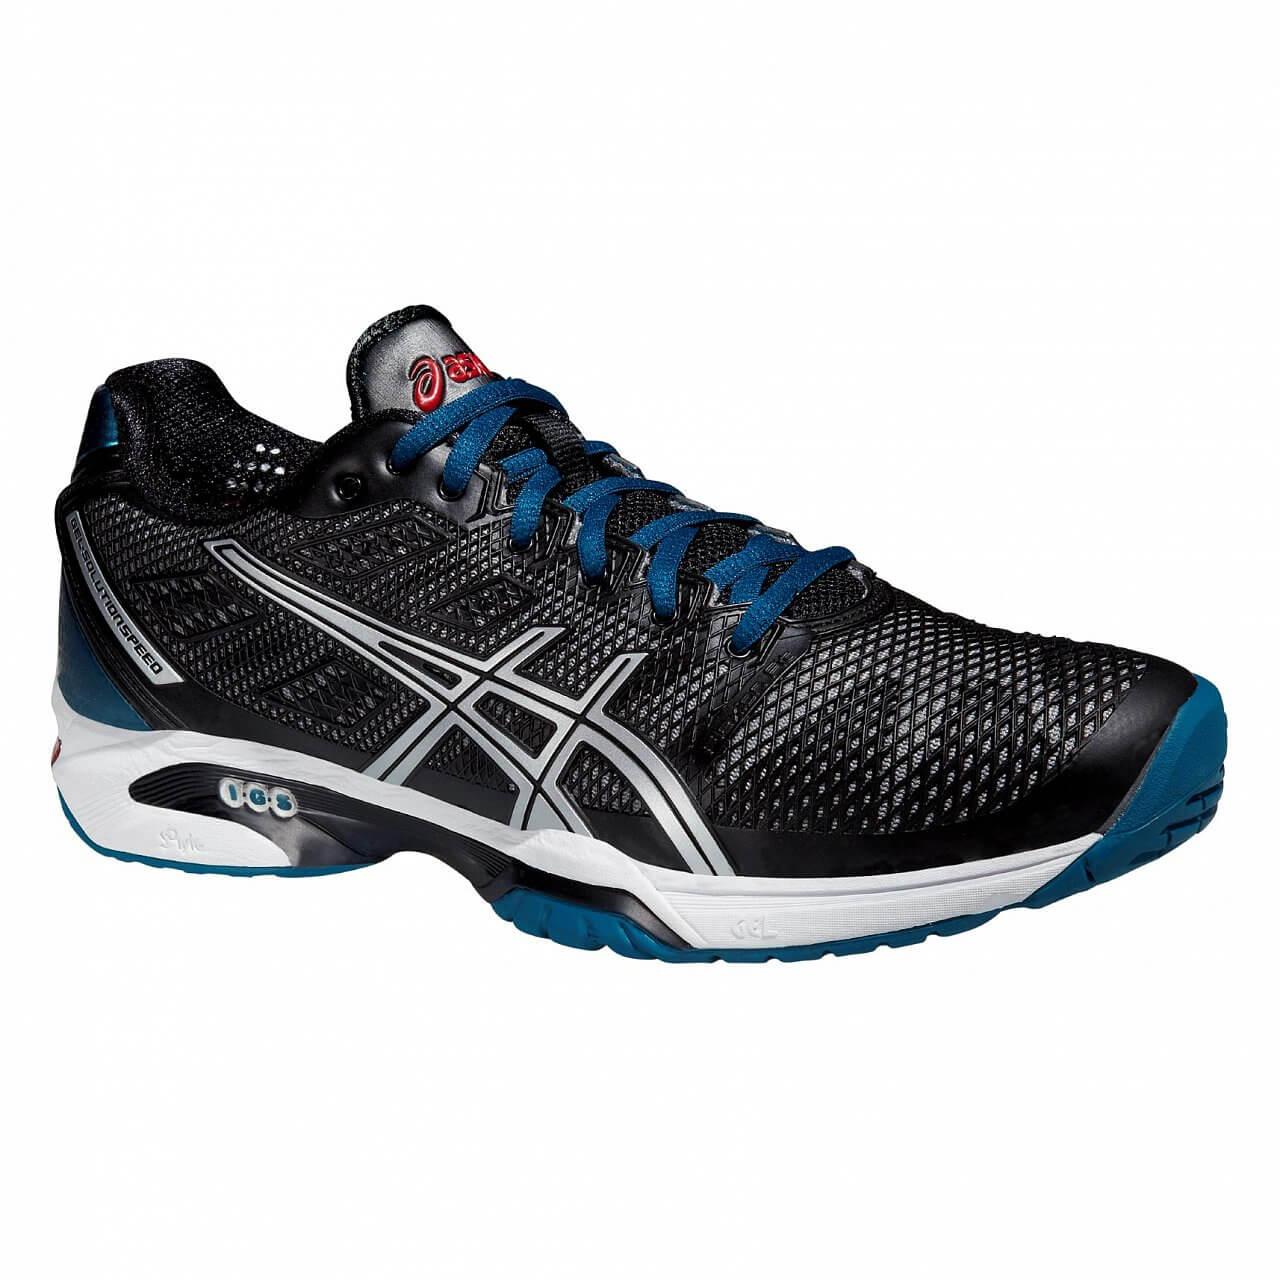 Pánská tenisová obuv Asics Gel Solution Speed 2 Clay